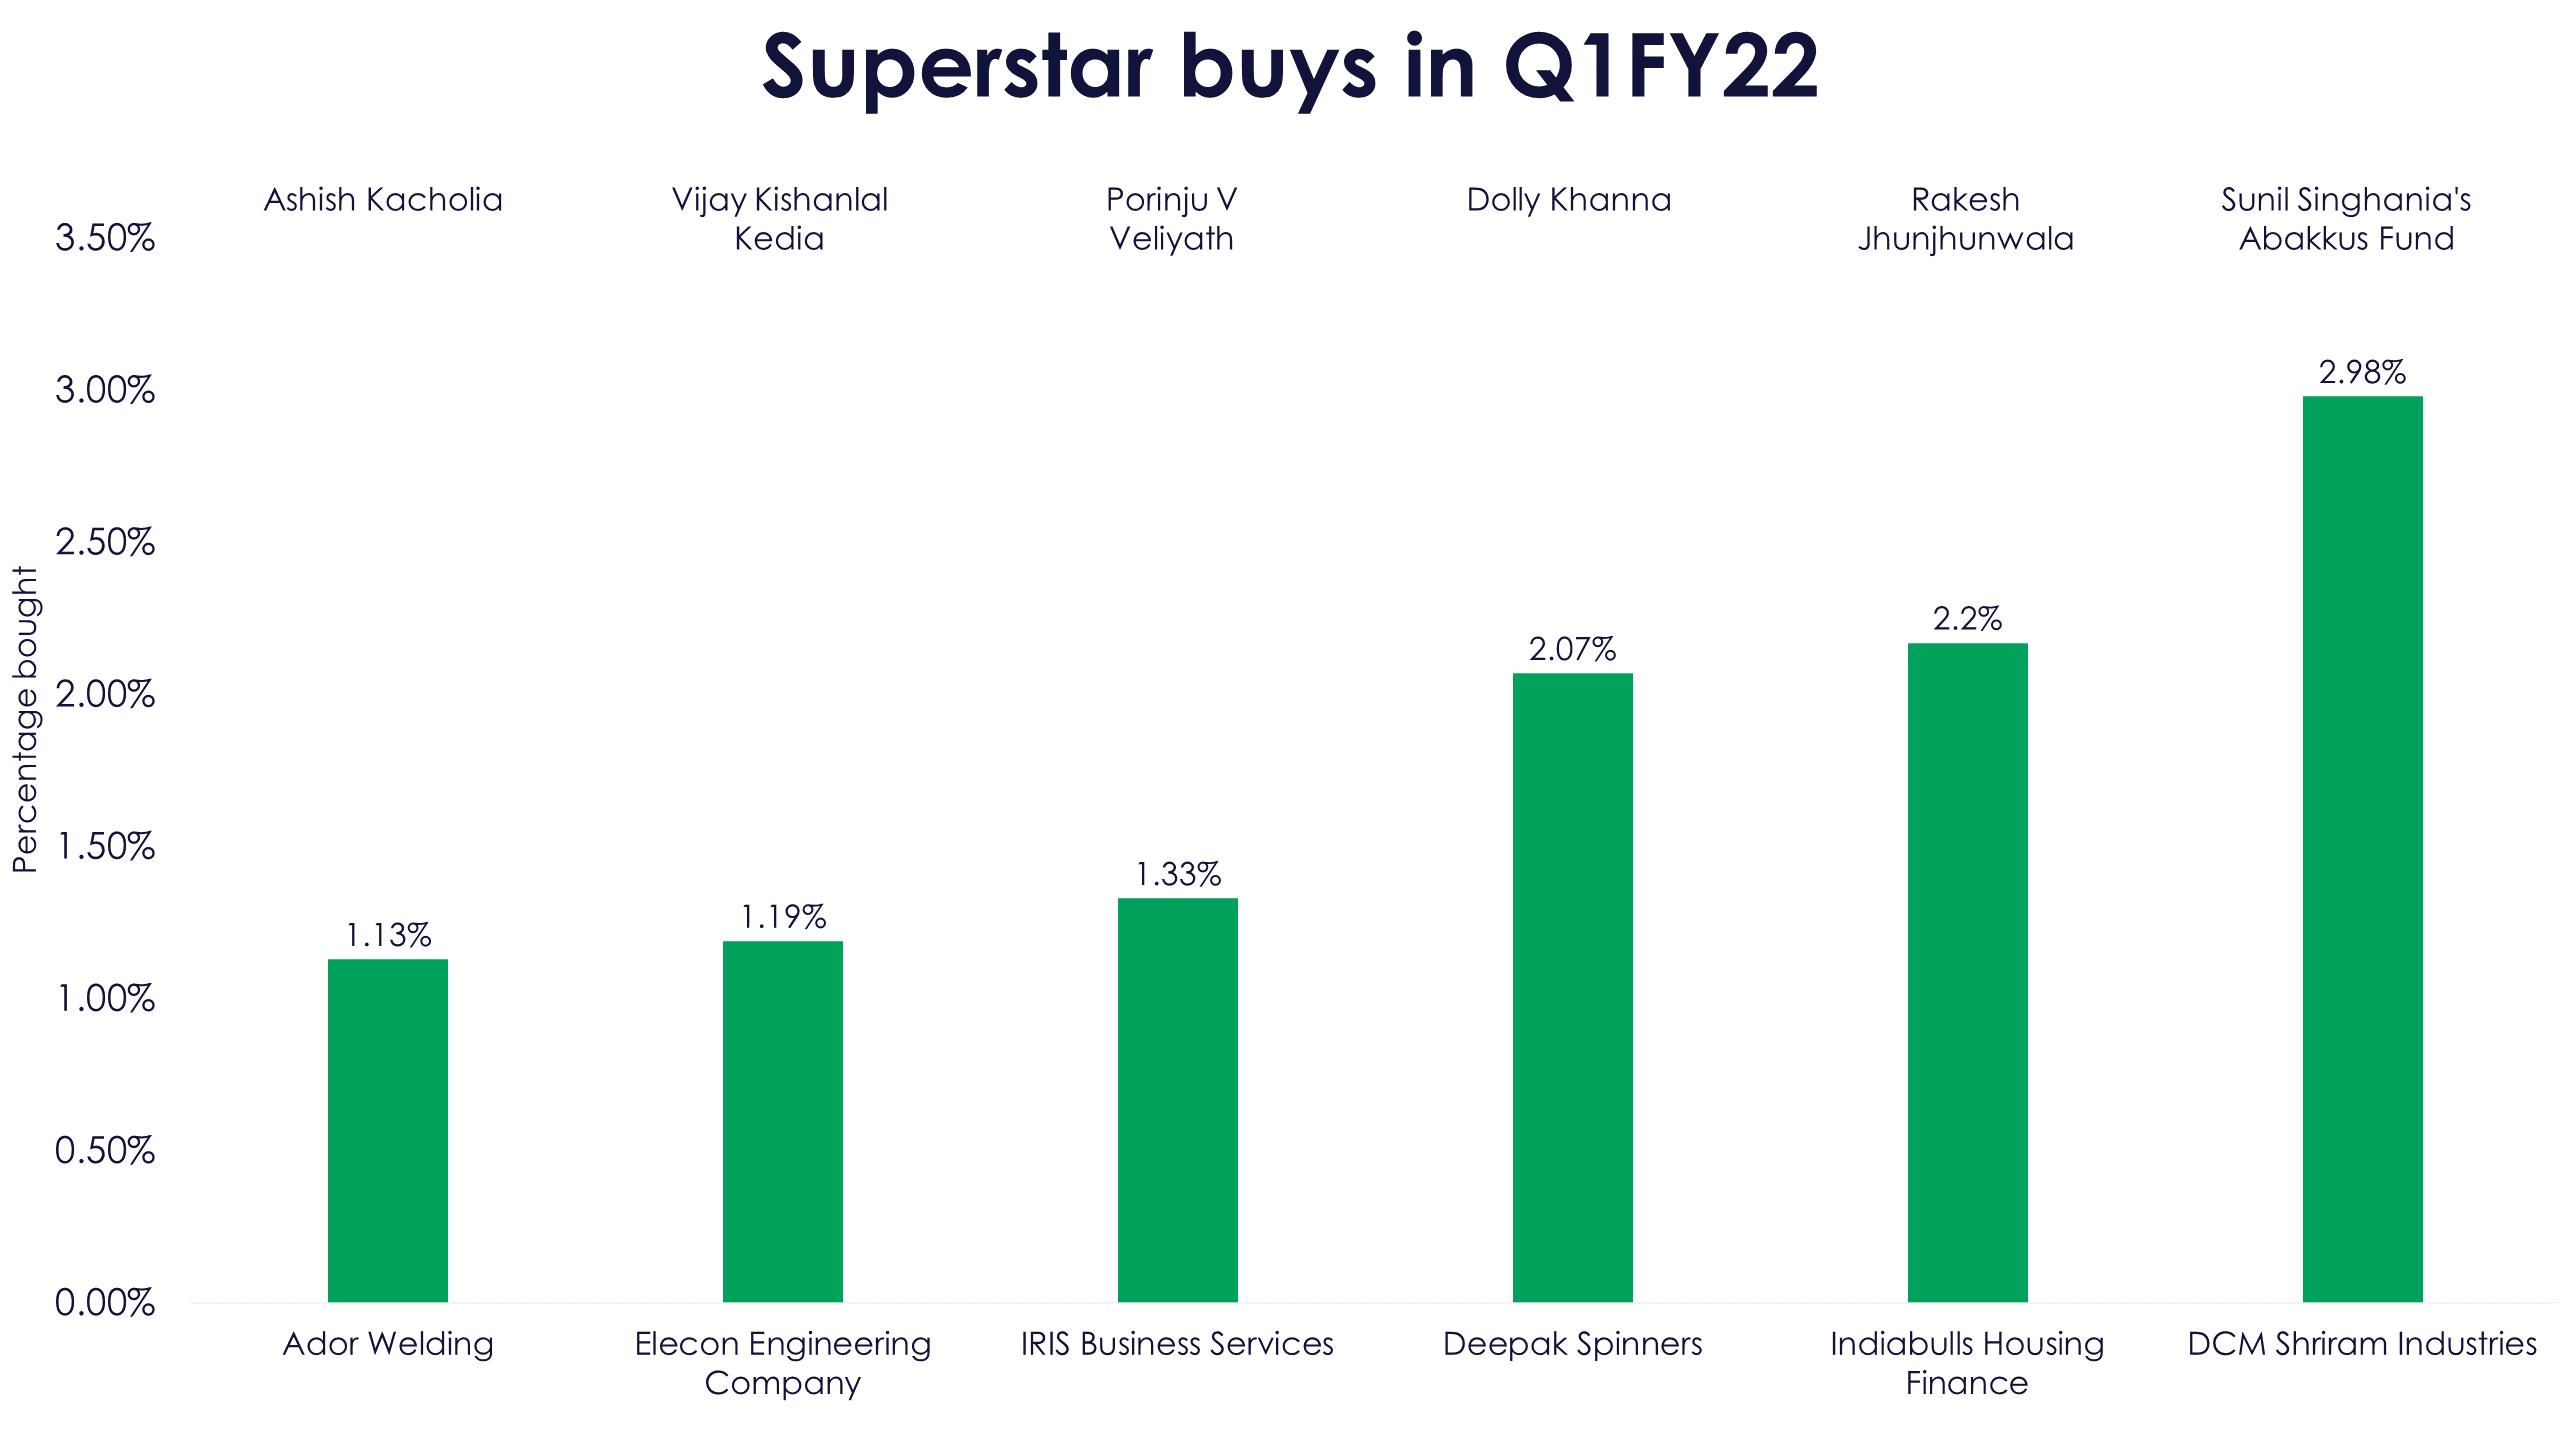 Superstar buys